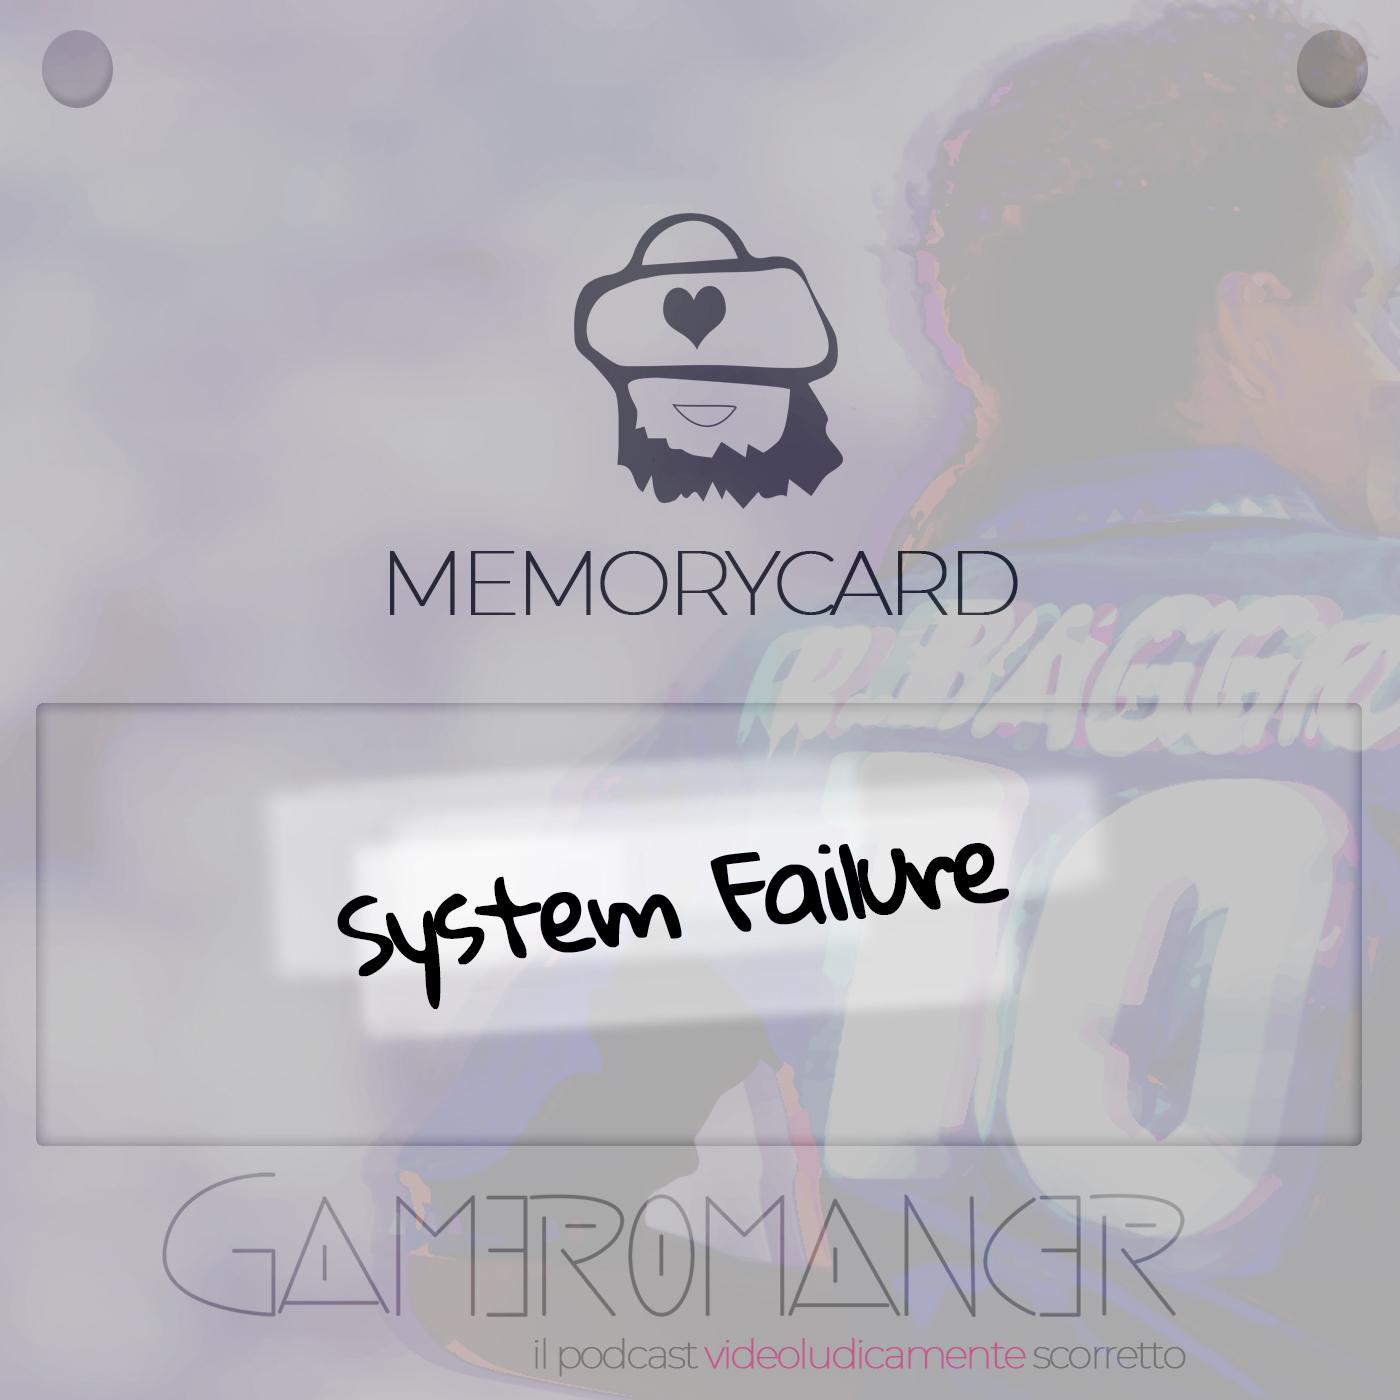 MemoryCard: System Failure